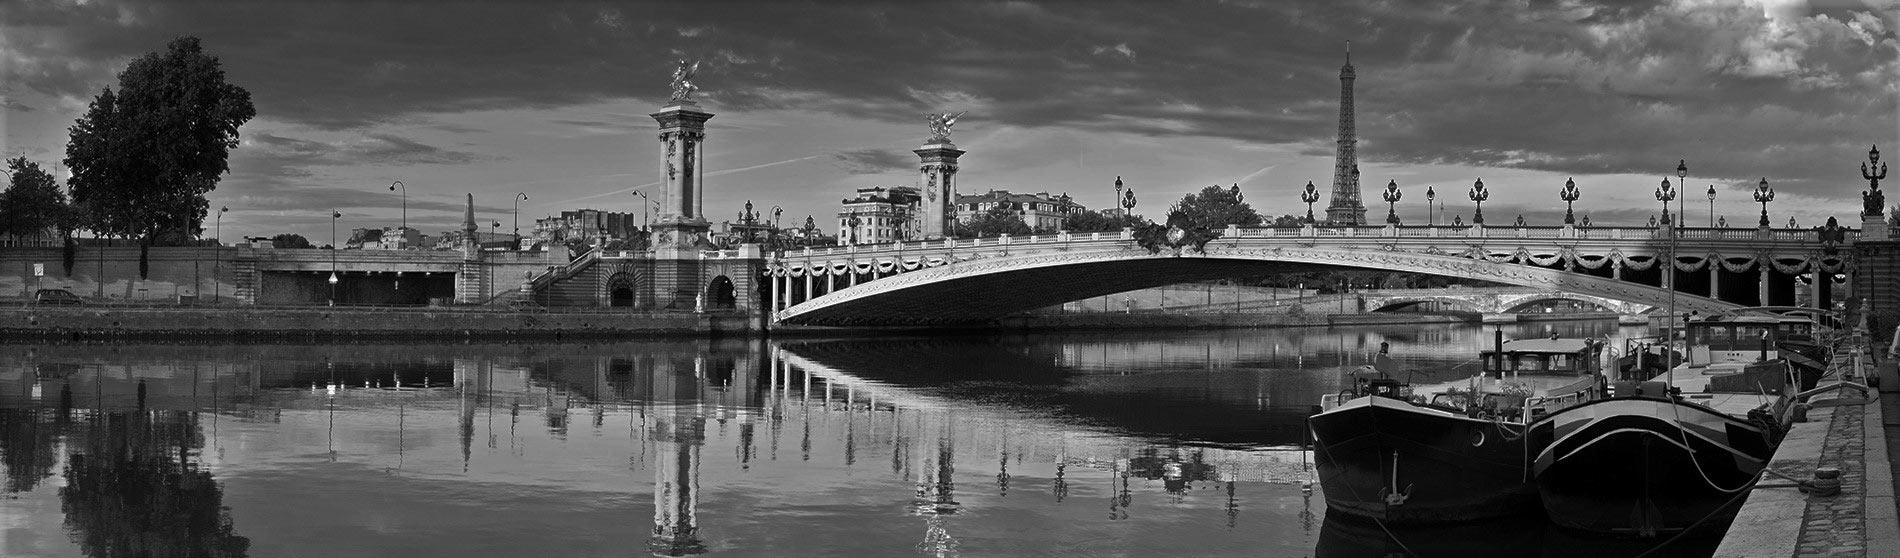 PARIS BY EMY Paris Trip Planner with Private Tour Guide